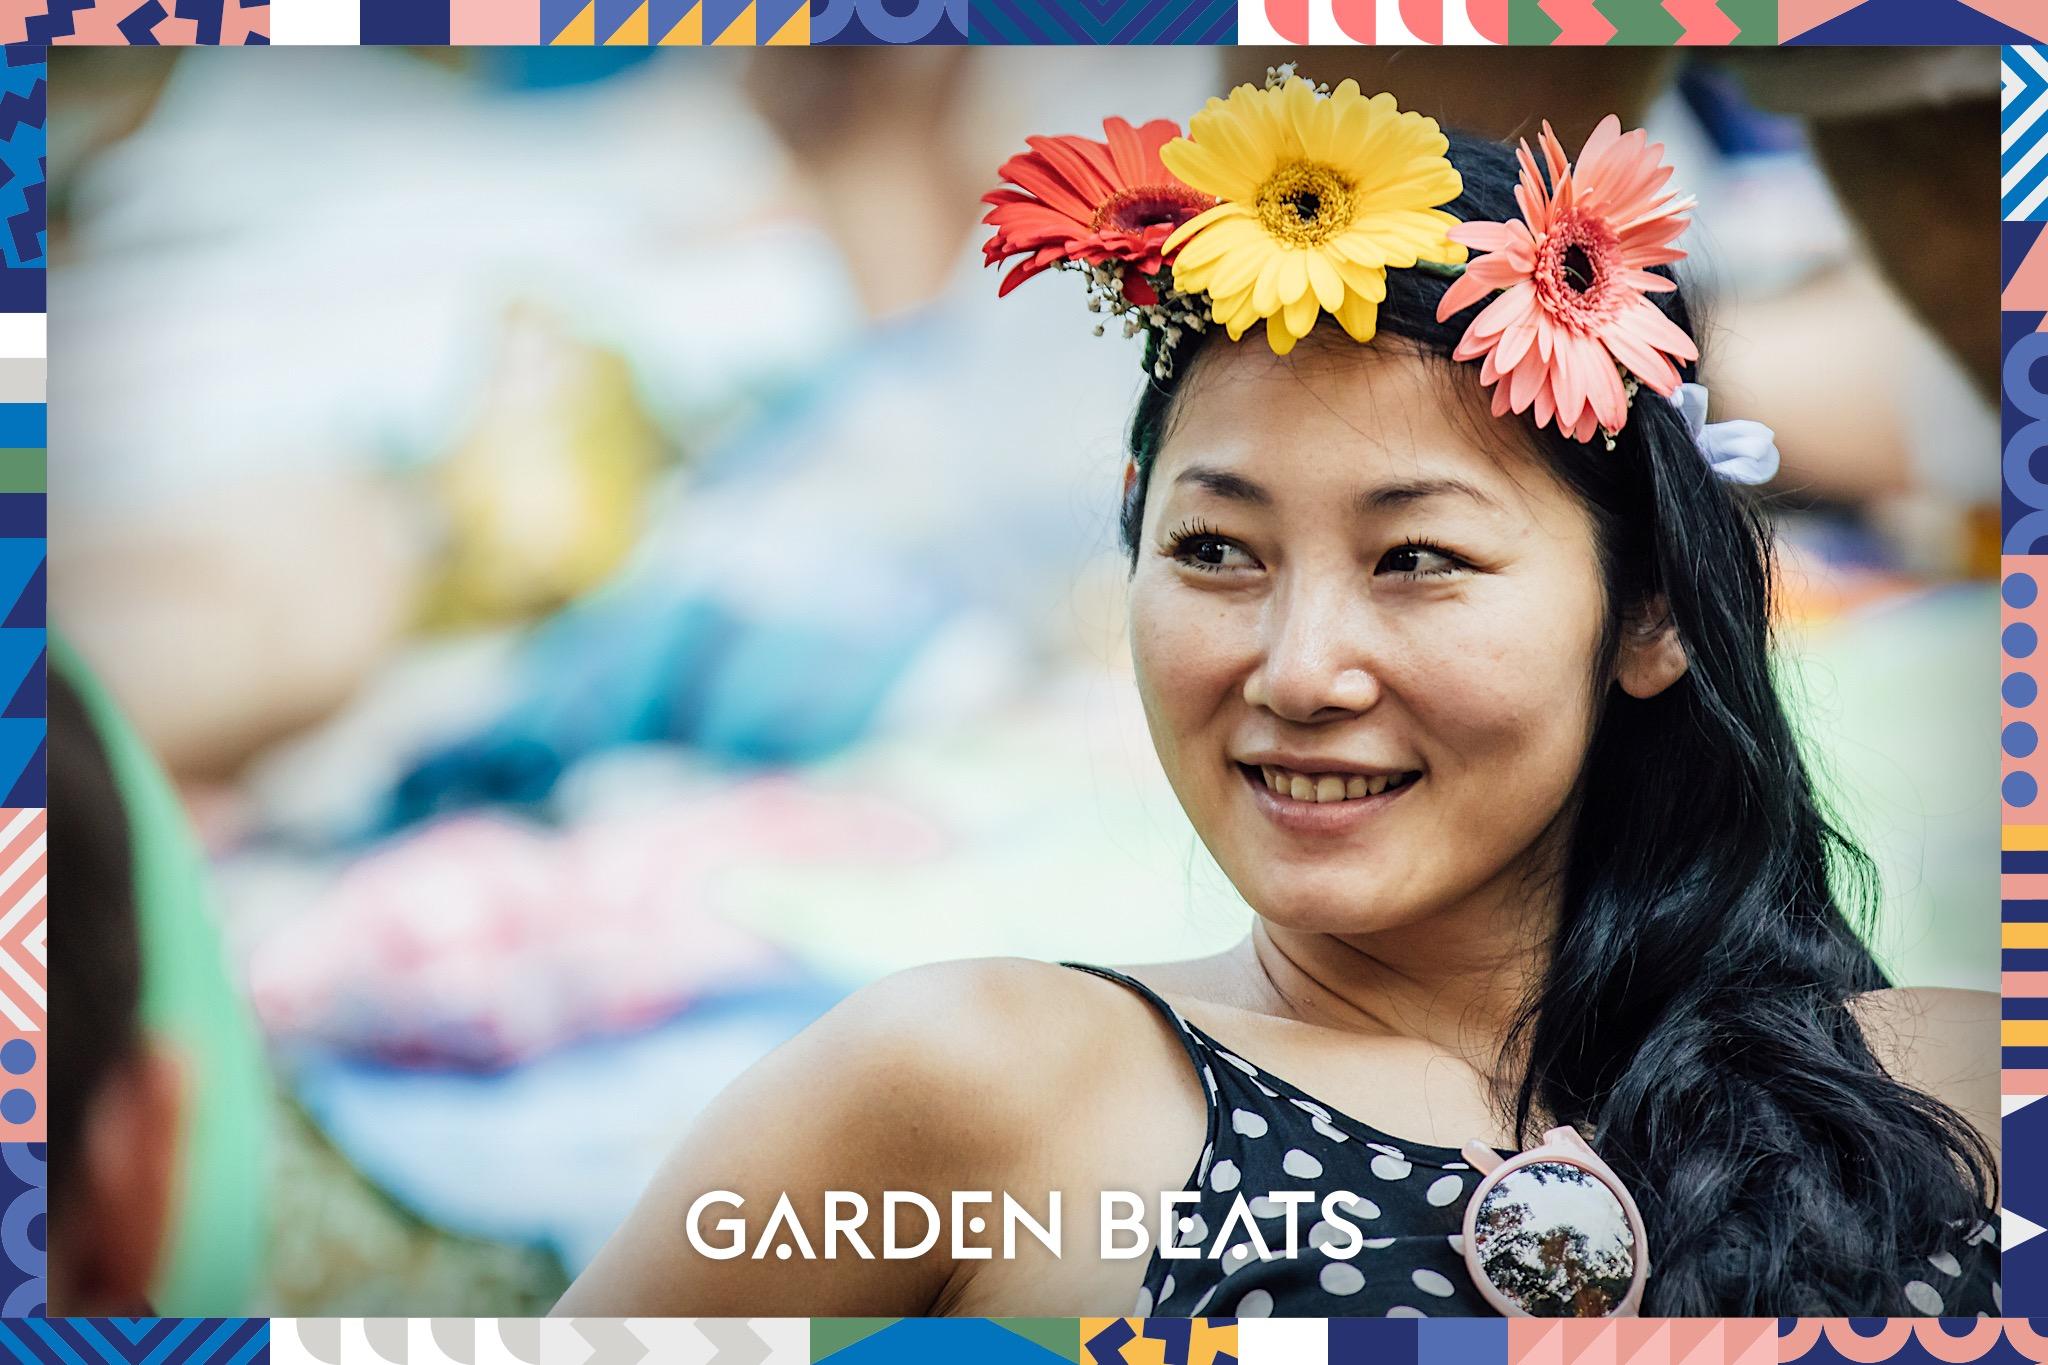 18032017_GardenBeats_Colossal637_WatermarkedGB.jpg